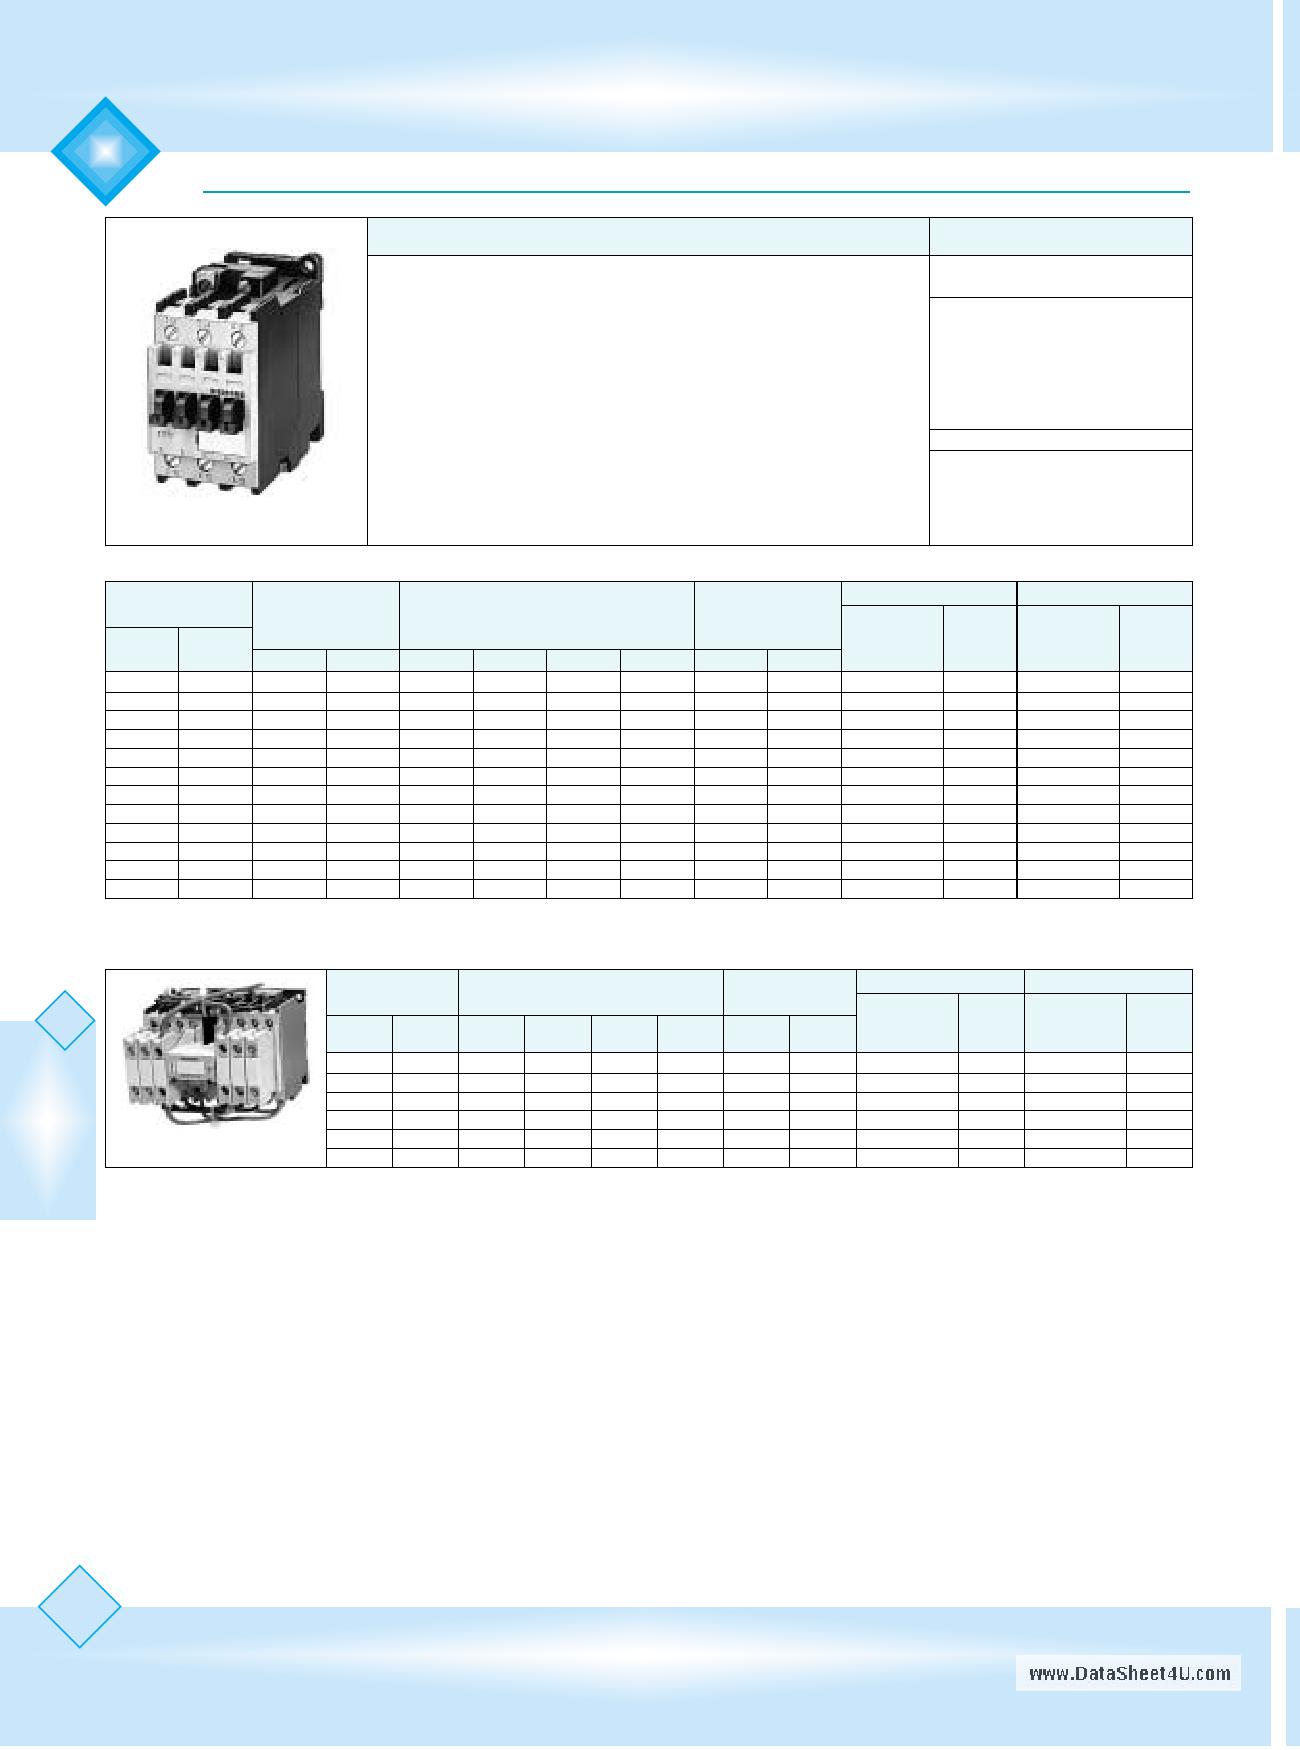 3TF3110-0A Datasheet, 3TF3110-0A PDF,ピン配置, 機能